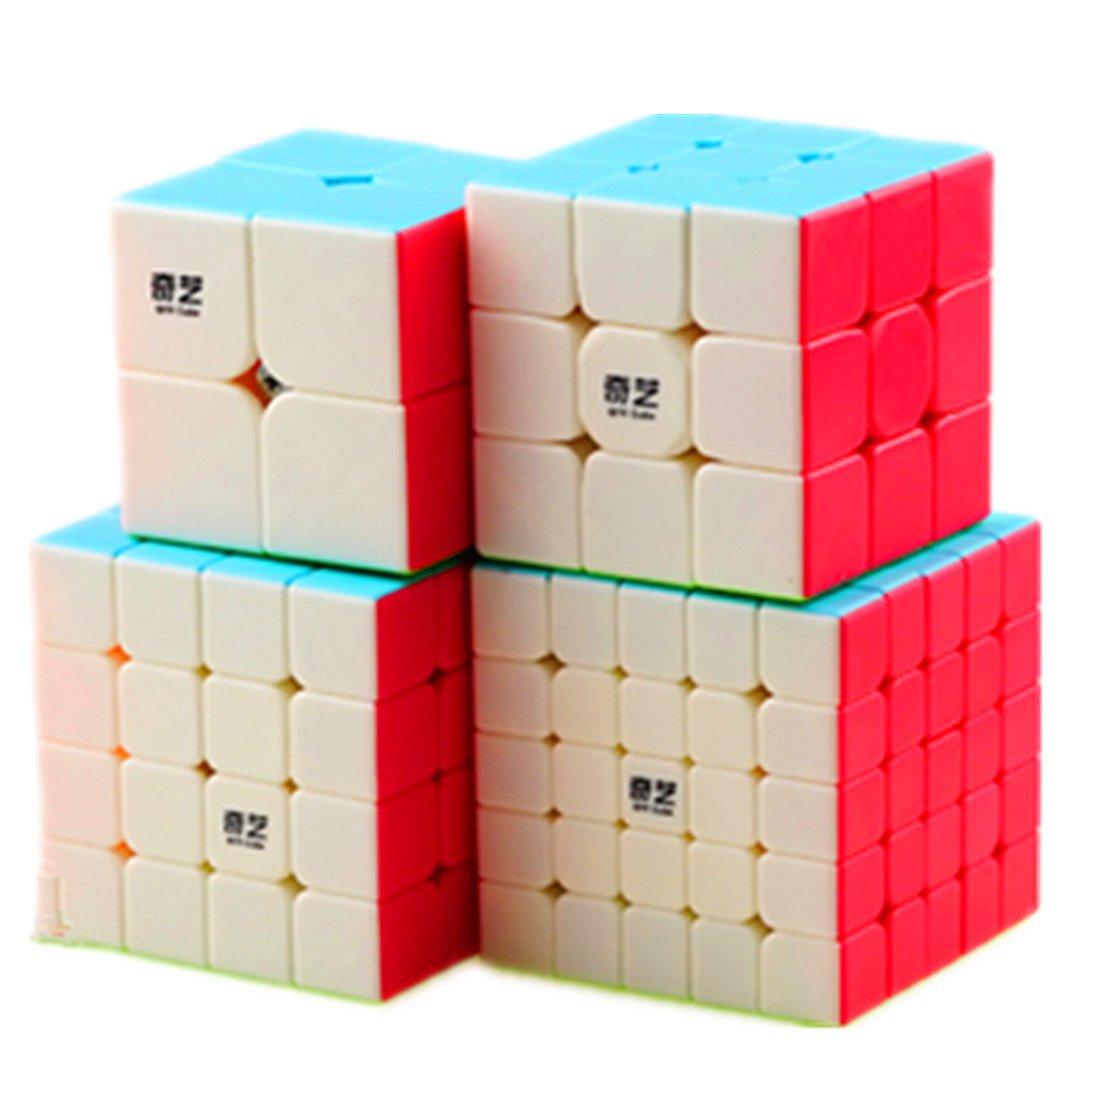 CuberSpeed Speedcubing Bundle Qiyi Qidi S 2X2 & Qiyi Warrior W 3x3 & Qiyi Qiyuan S 4X4 & qizheng s 5X5 Stickerless Bright Magic cube Stickerless speed cube set